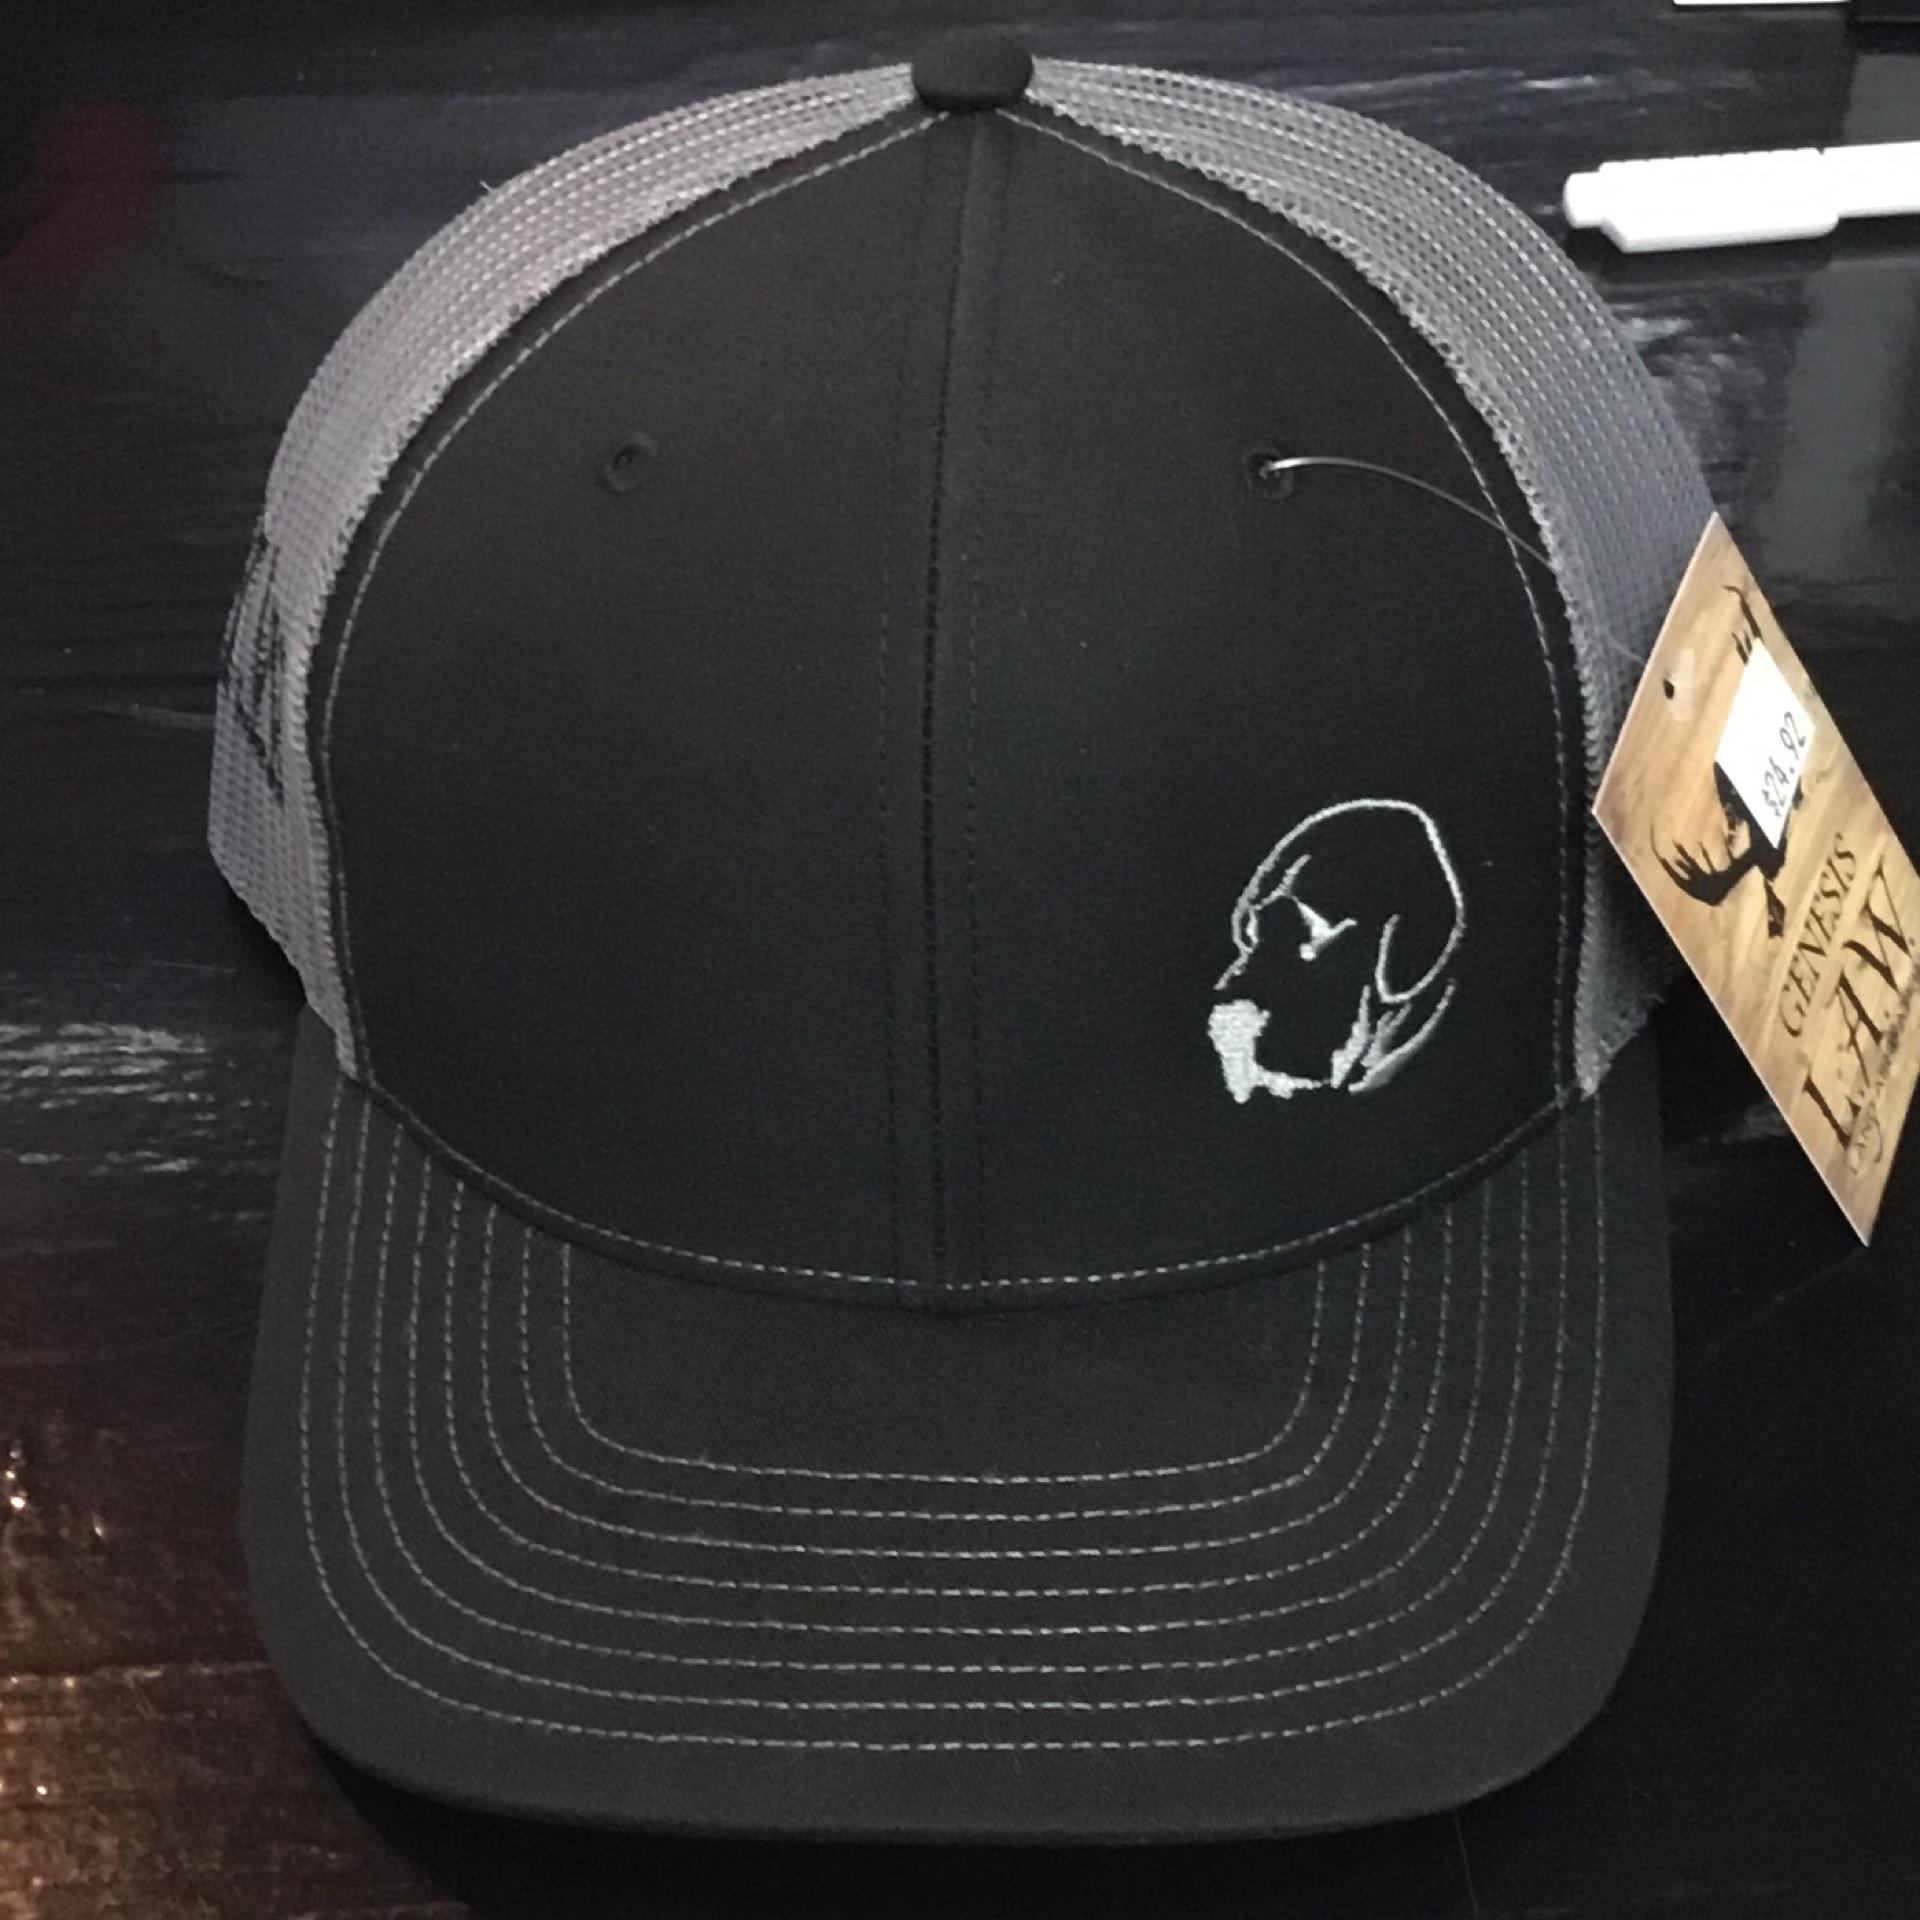 Small Lab Black/grey (Trucker) CHDDJKCXJREDHHUBHYC4WTHN